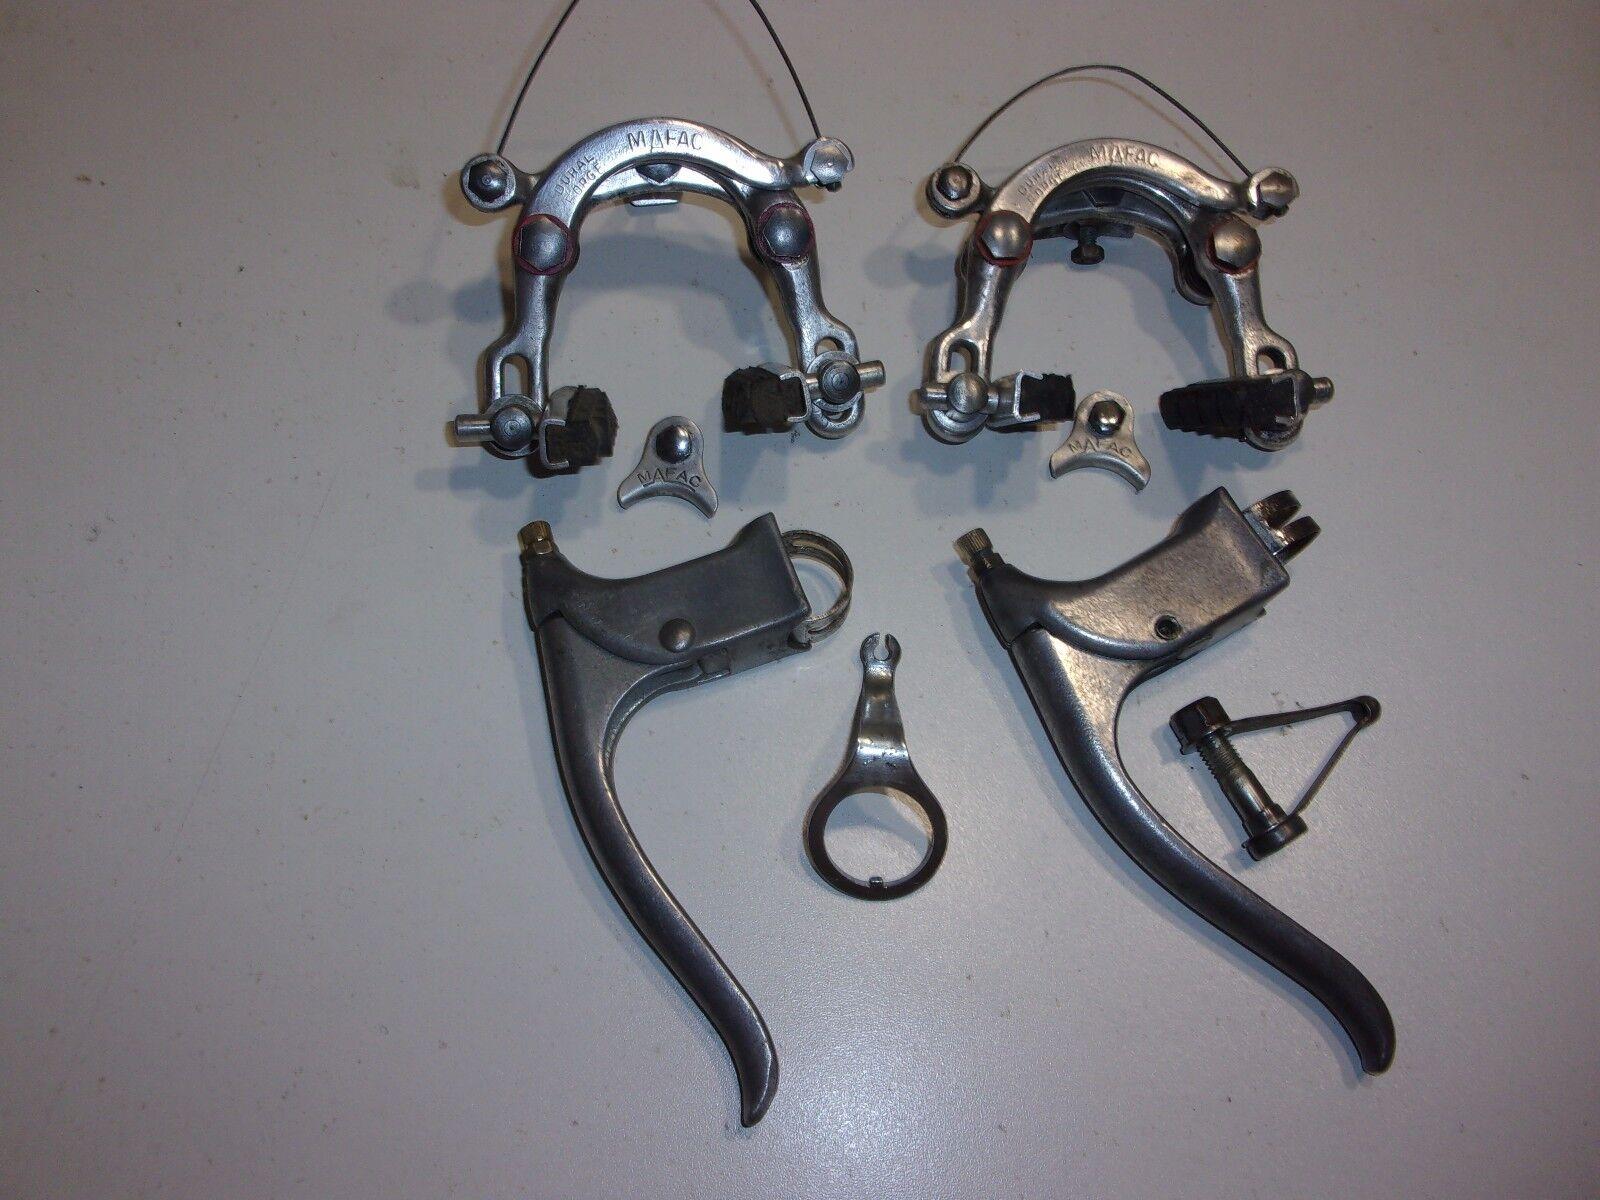 Freins Mafac dural forge old brakes levers made in France vintage pontet arrière